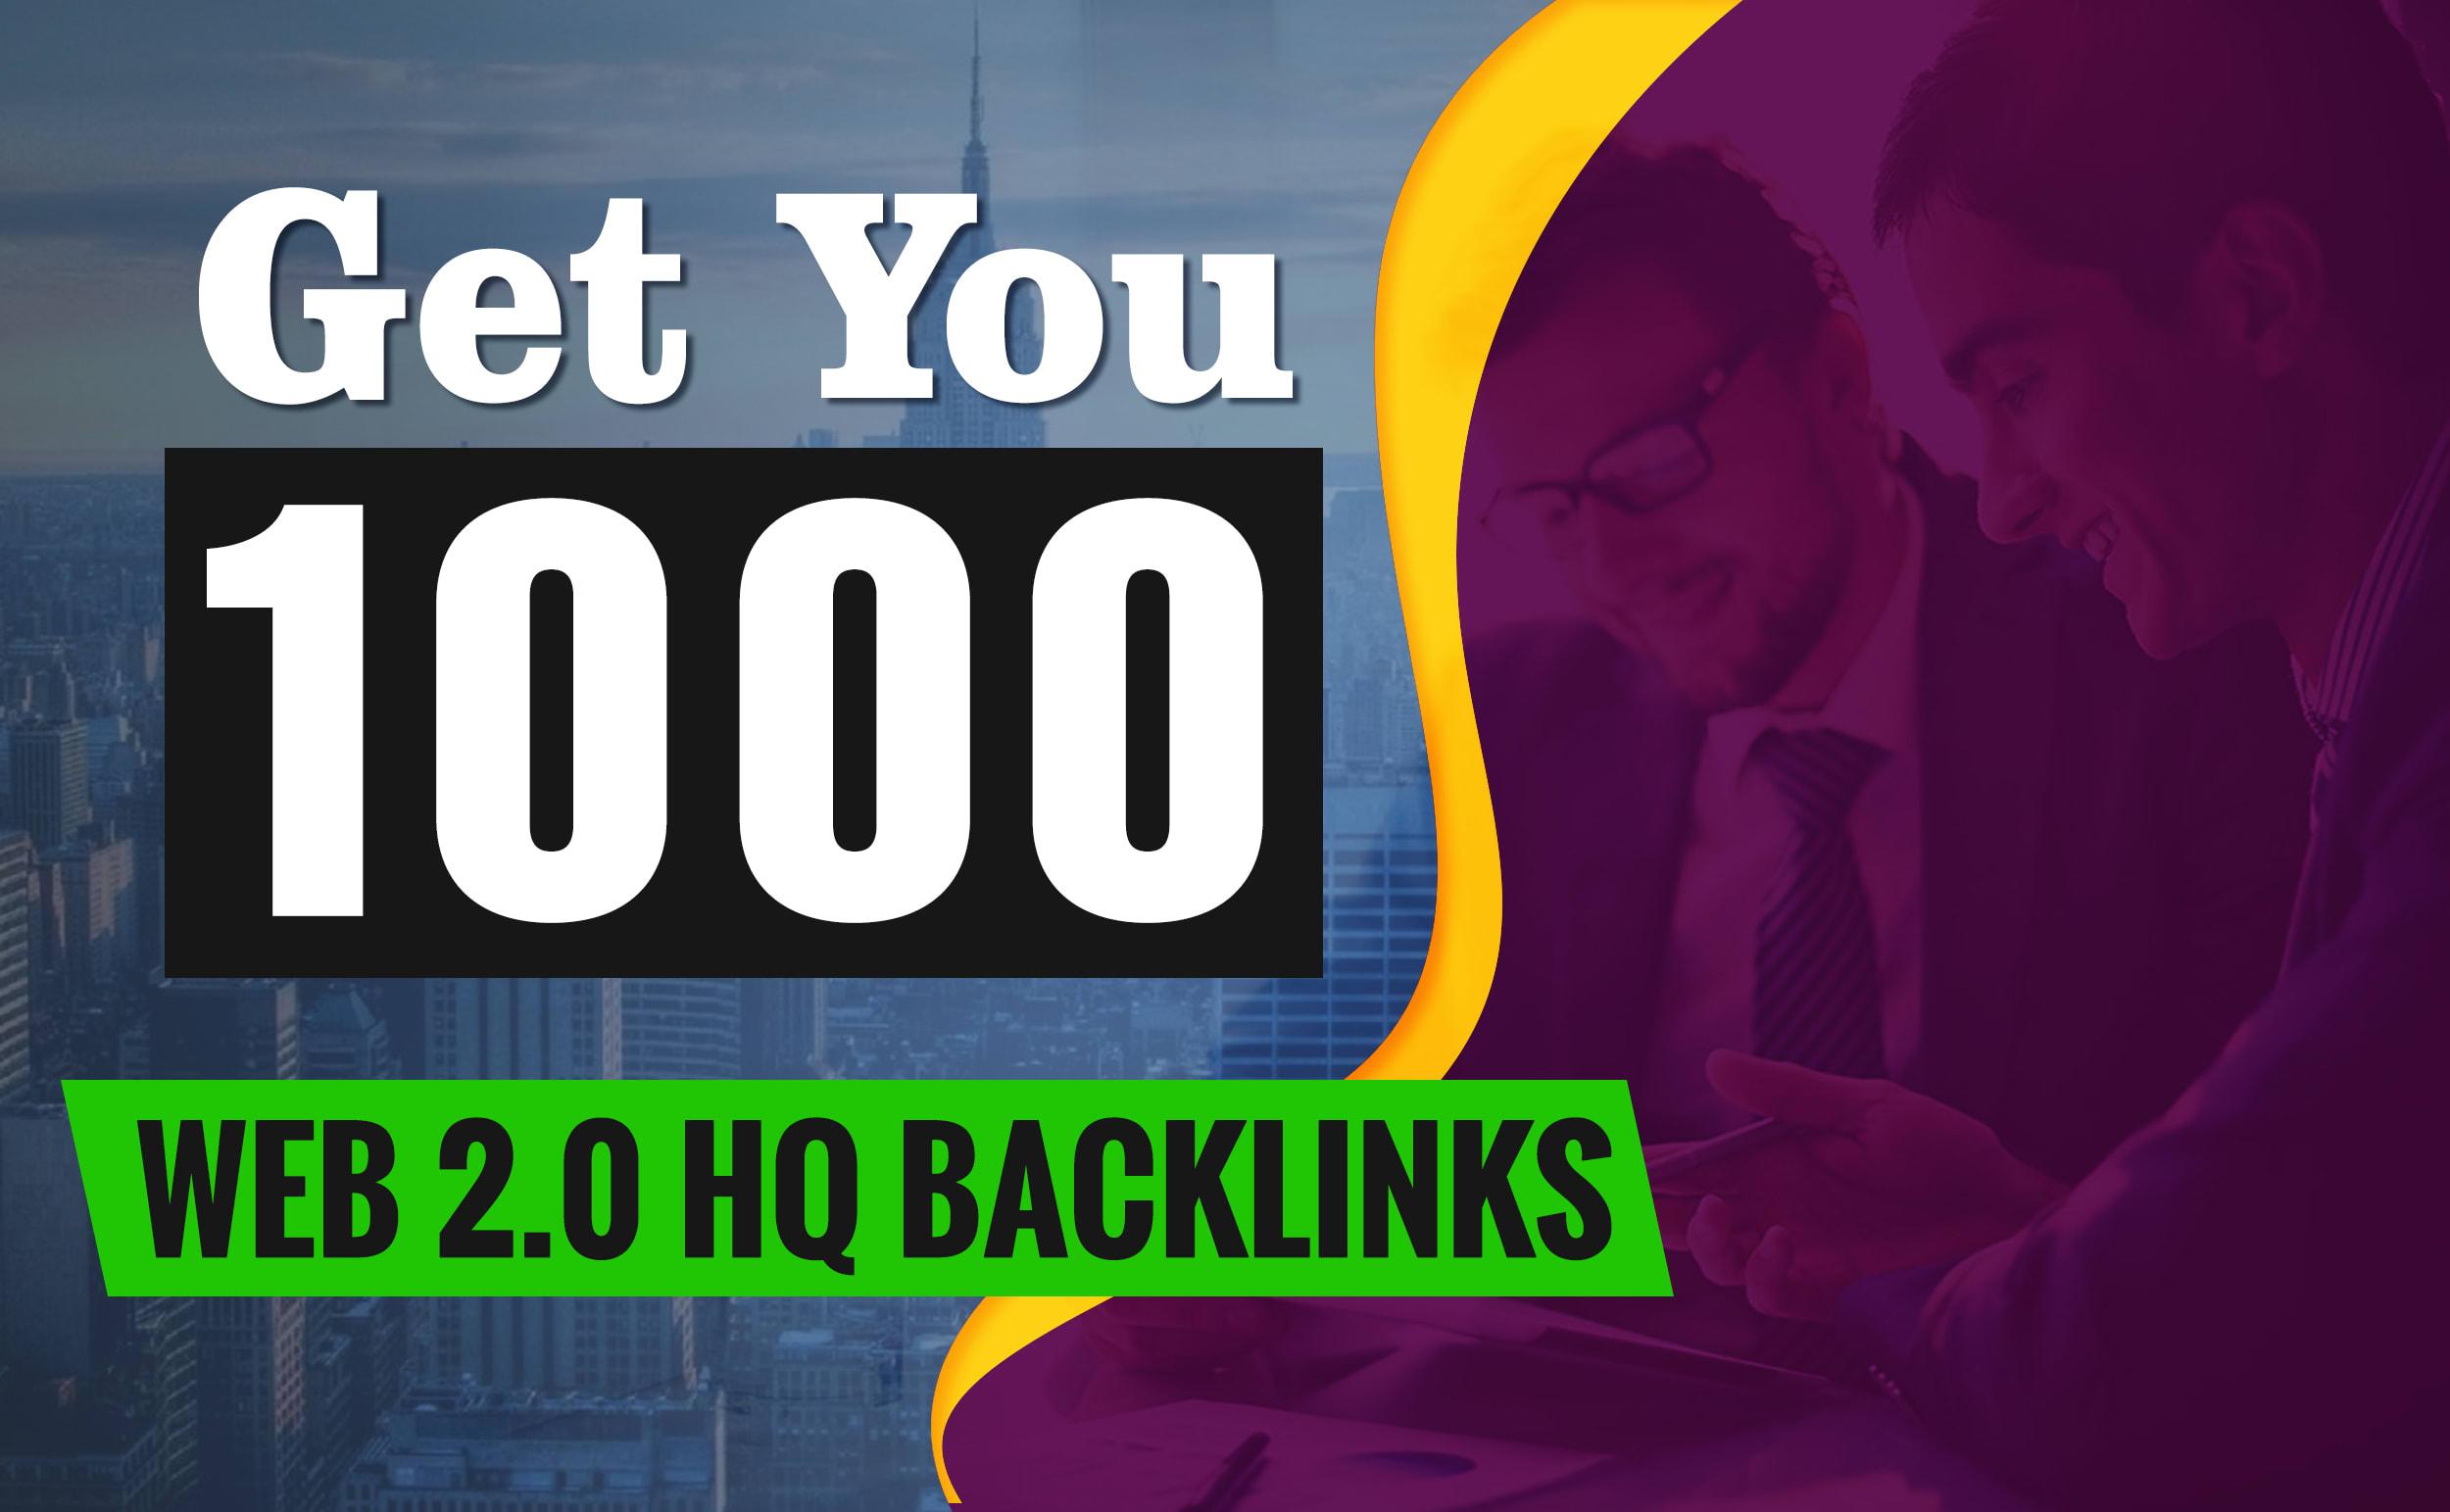 Get you 1,000 Web 2.0 High Quality backlinks